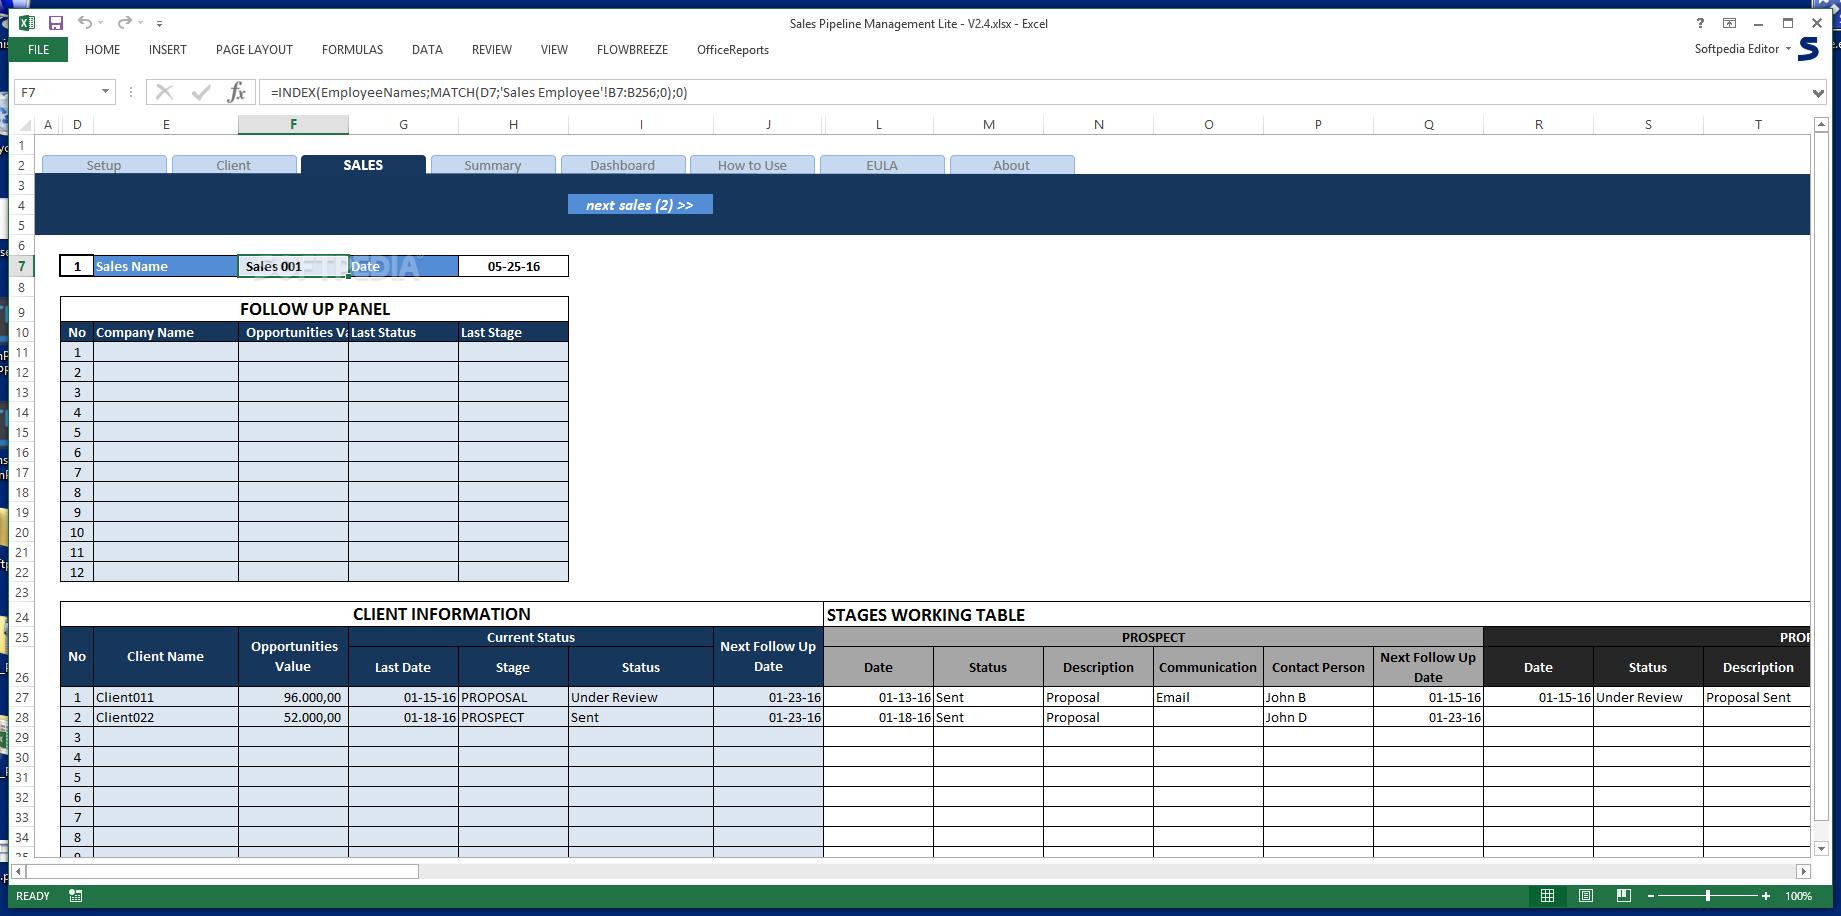 download sales pipeline management lite 2 4